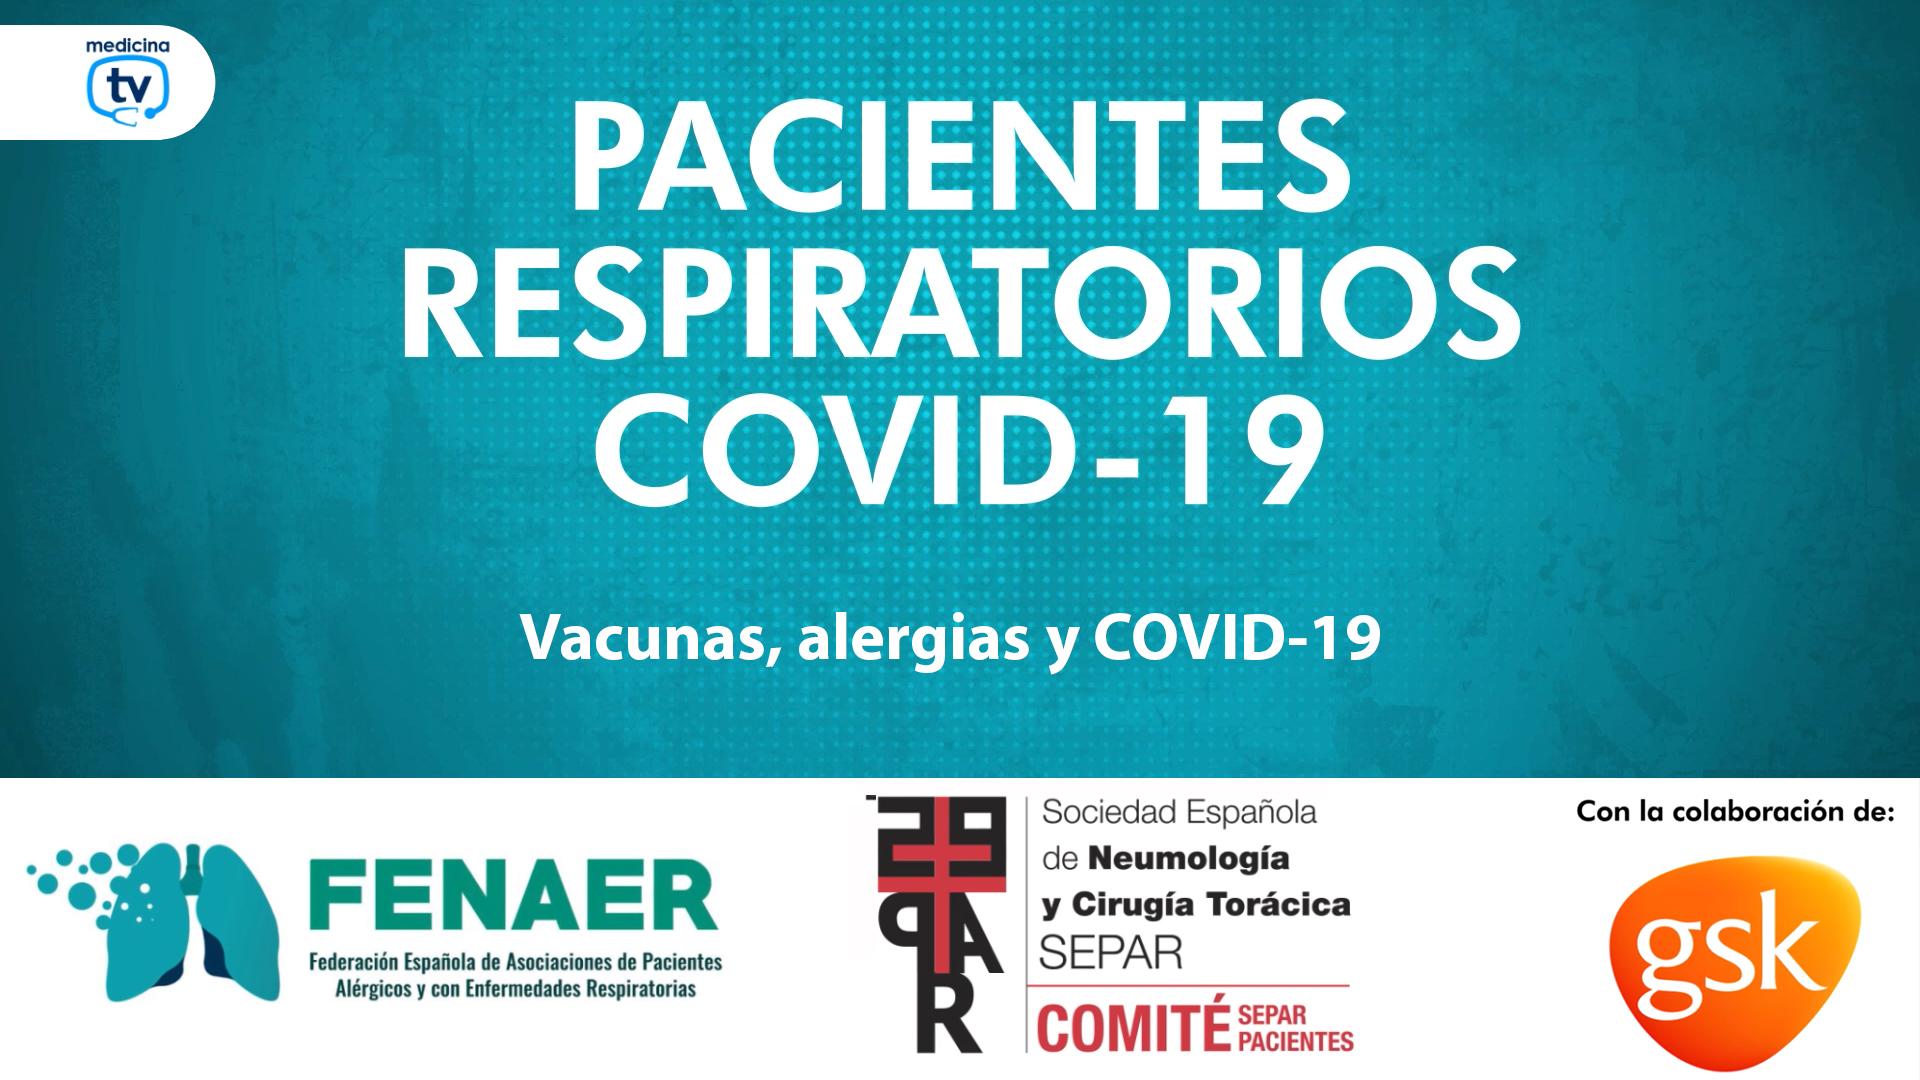 La administración de vacunas para rinitis alérgica puede posponerse 2 o 3 meses a fin de evitar acudir a centros sanitarios durante la pandemia